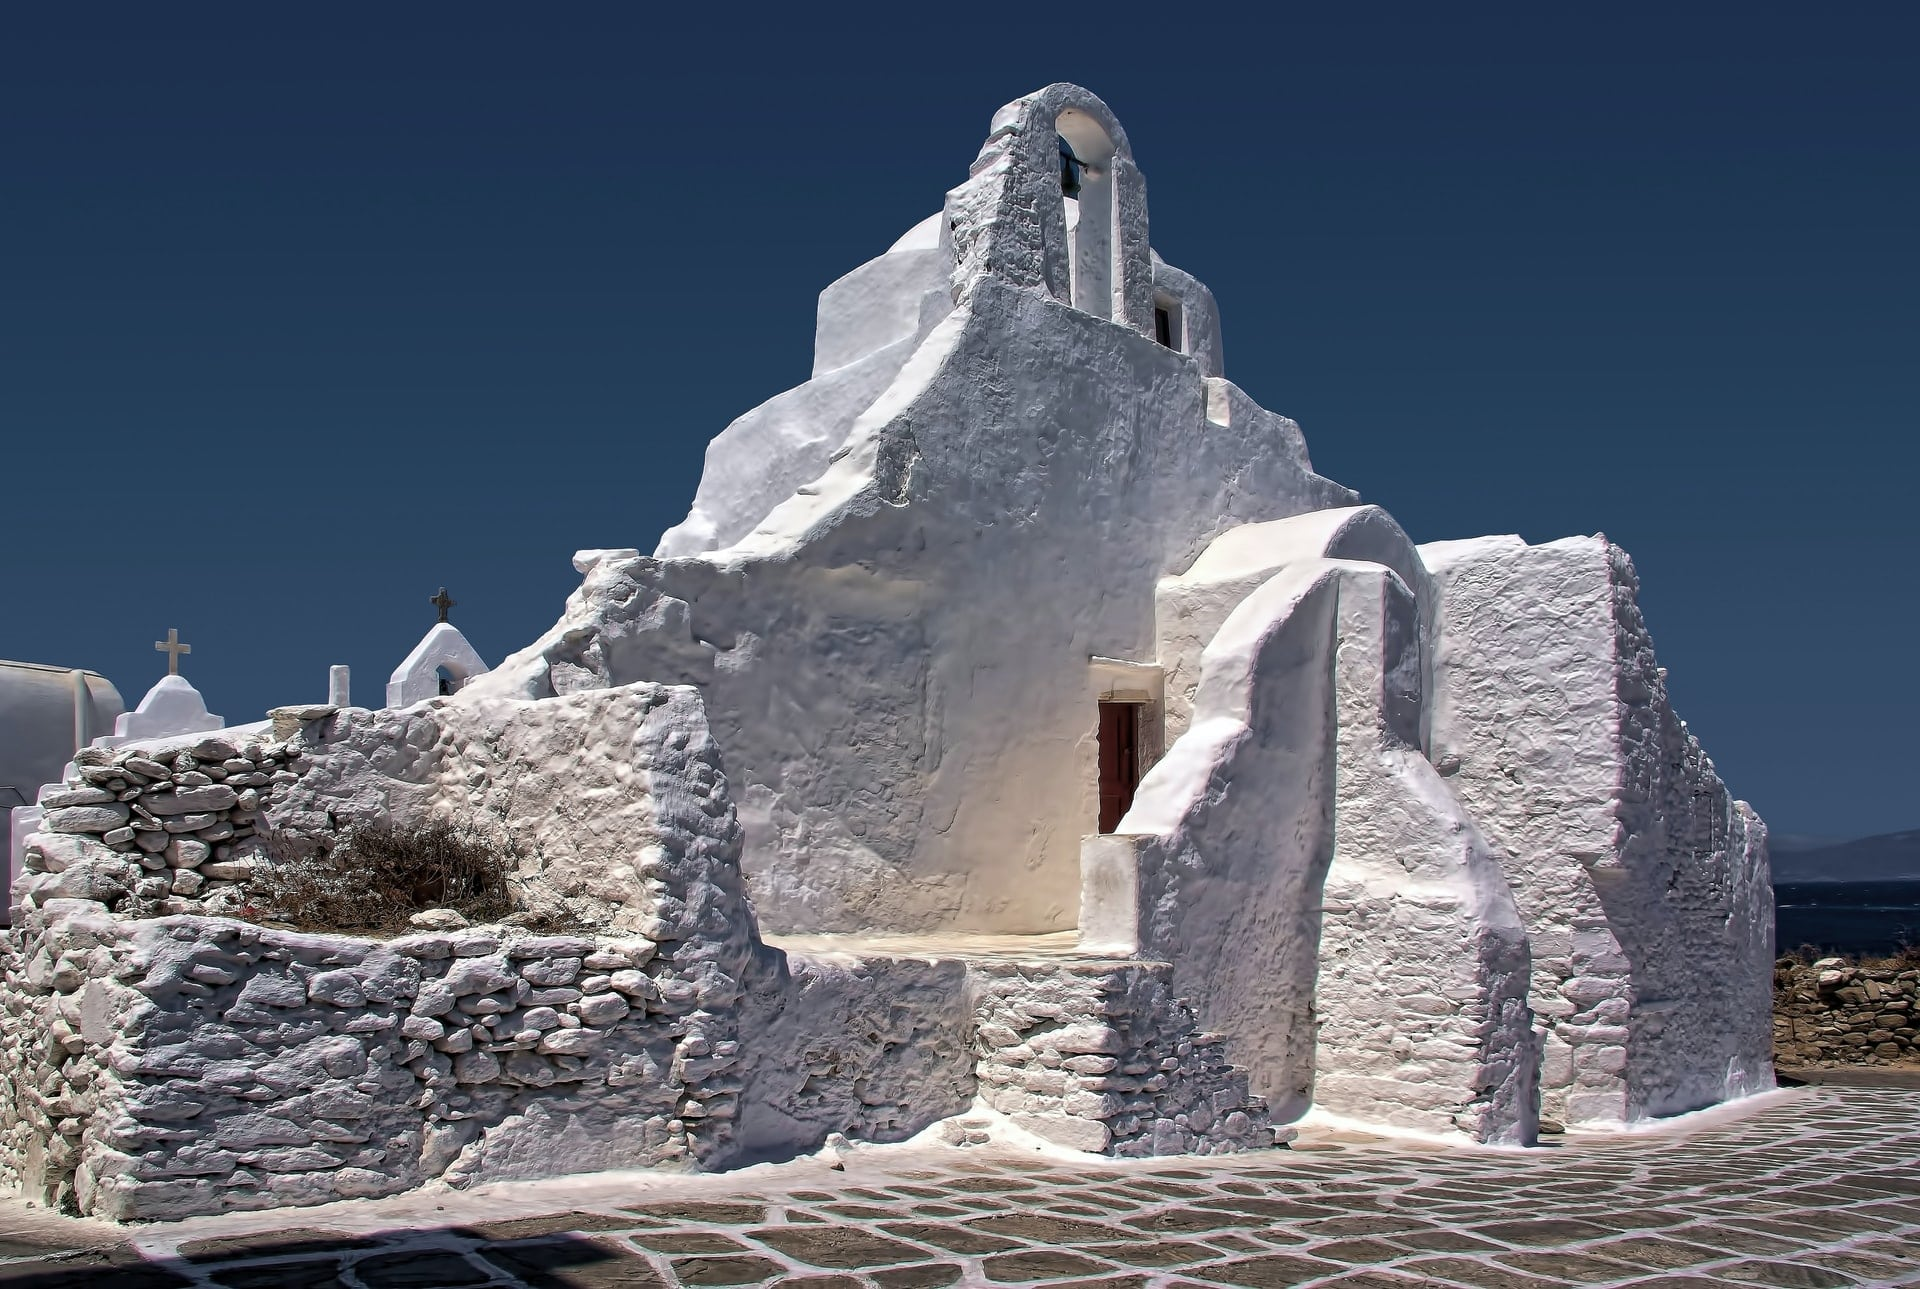 Mykonos The Church of Panagia Paraportiani